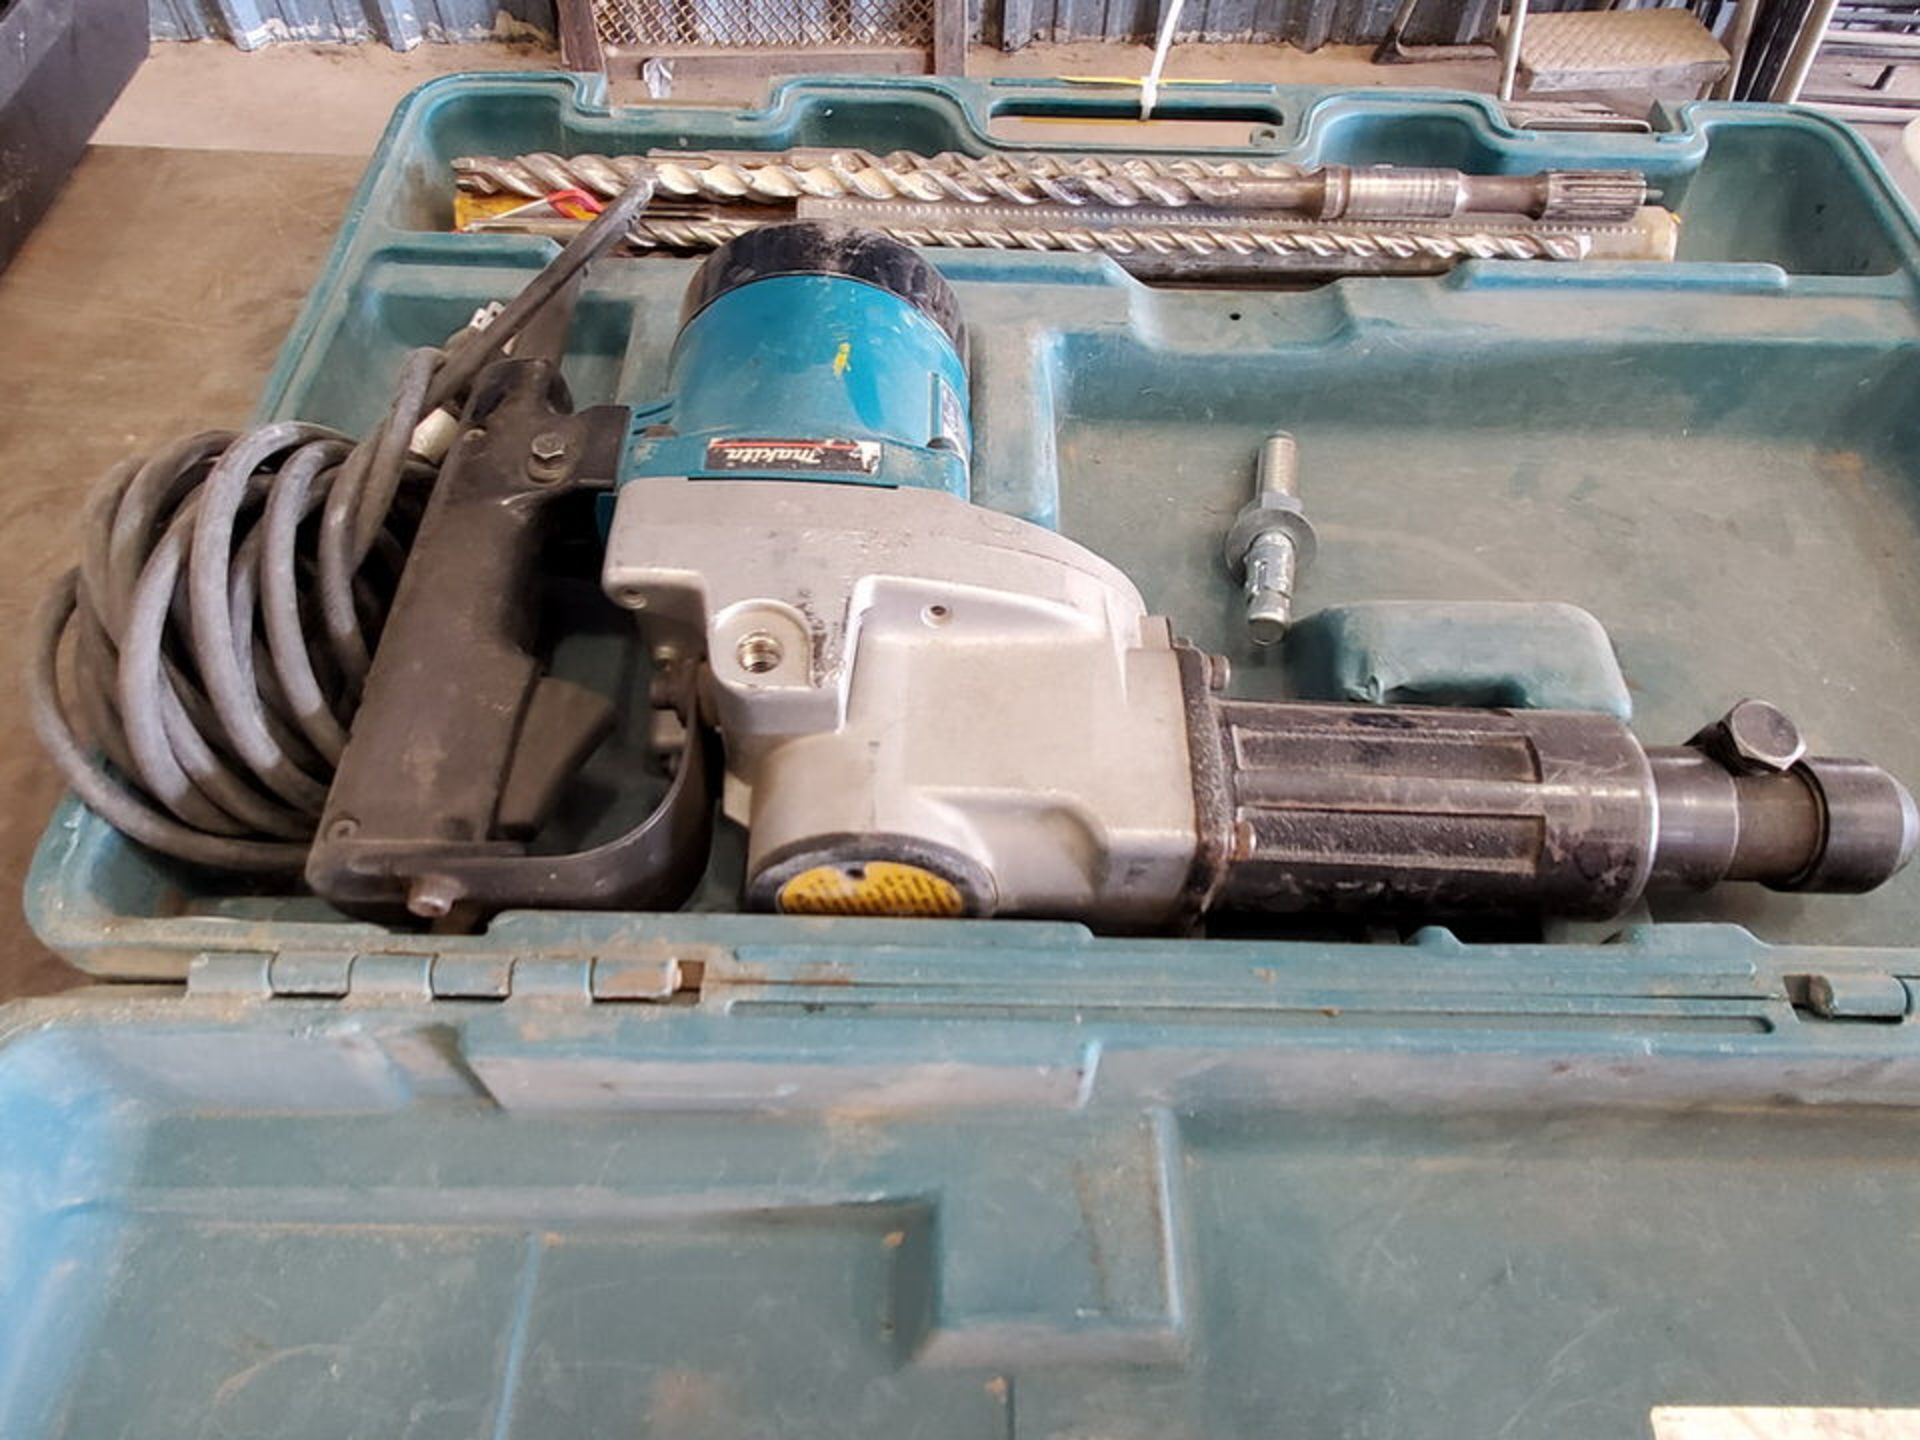 "Makita HR3851 1/2"" Rotary Hammer 120V, 10A, 2900RPM - Image 4 of 5"